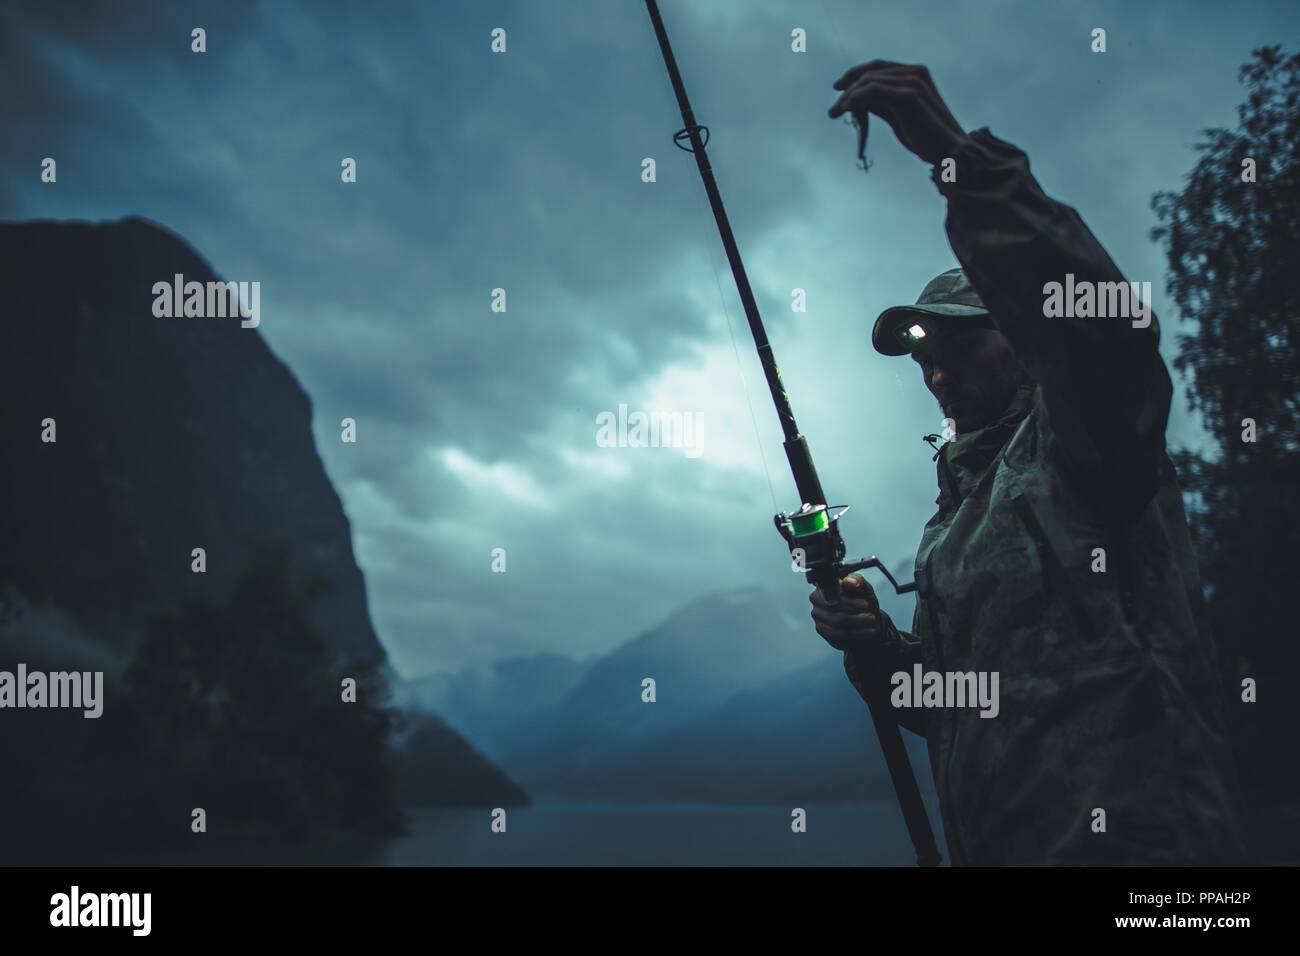 Late Rainy Evening Fly Fishing. Caucasian Fisherman Preparing His For Big Catch. - Stock Image